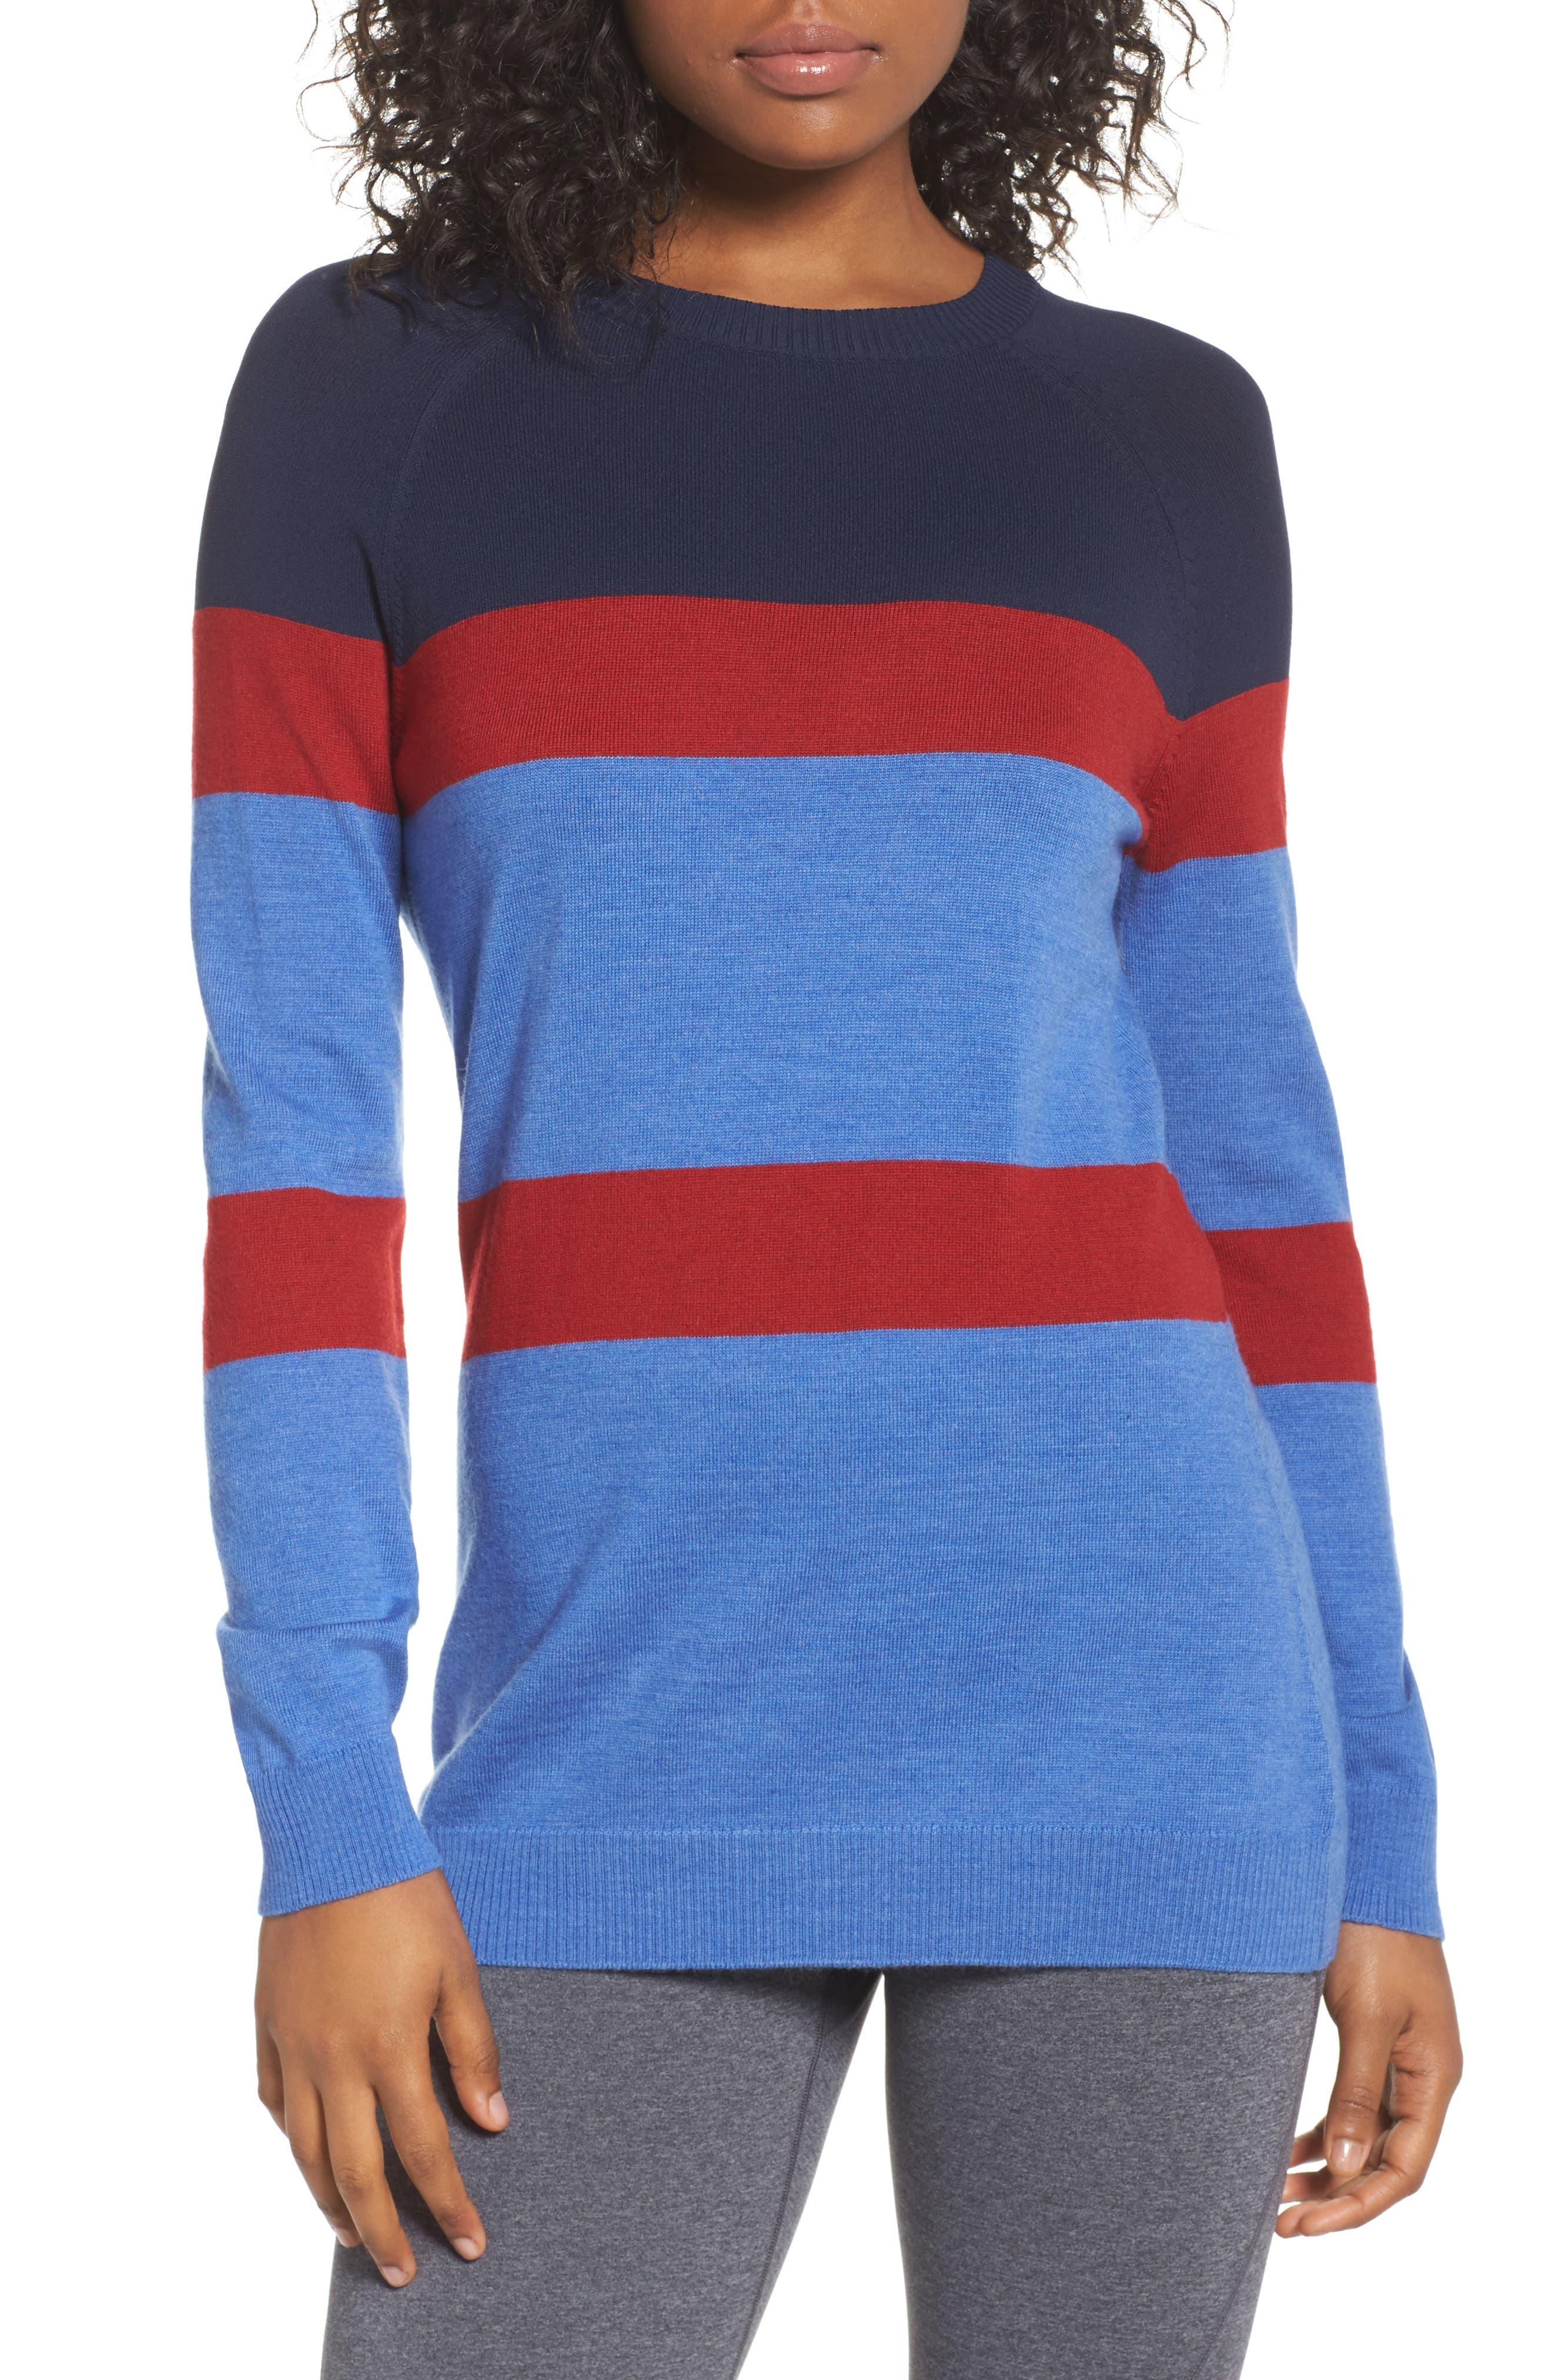 Alternate Image 1 Selected - LNDR Apres Sweater